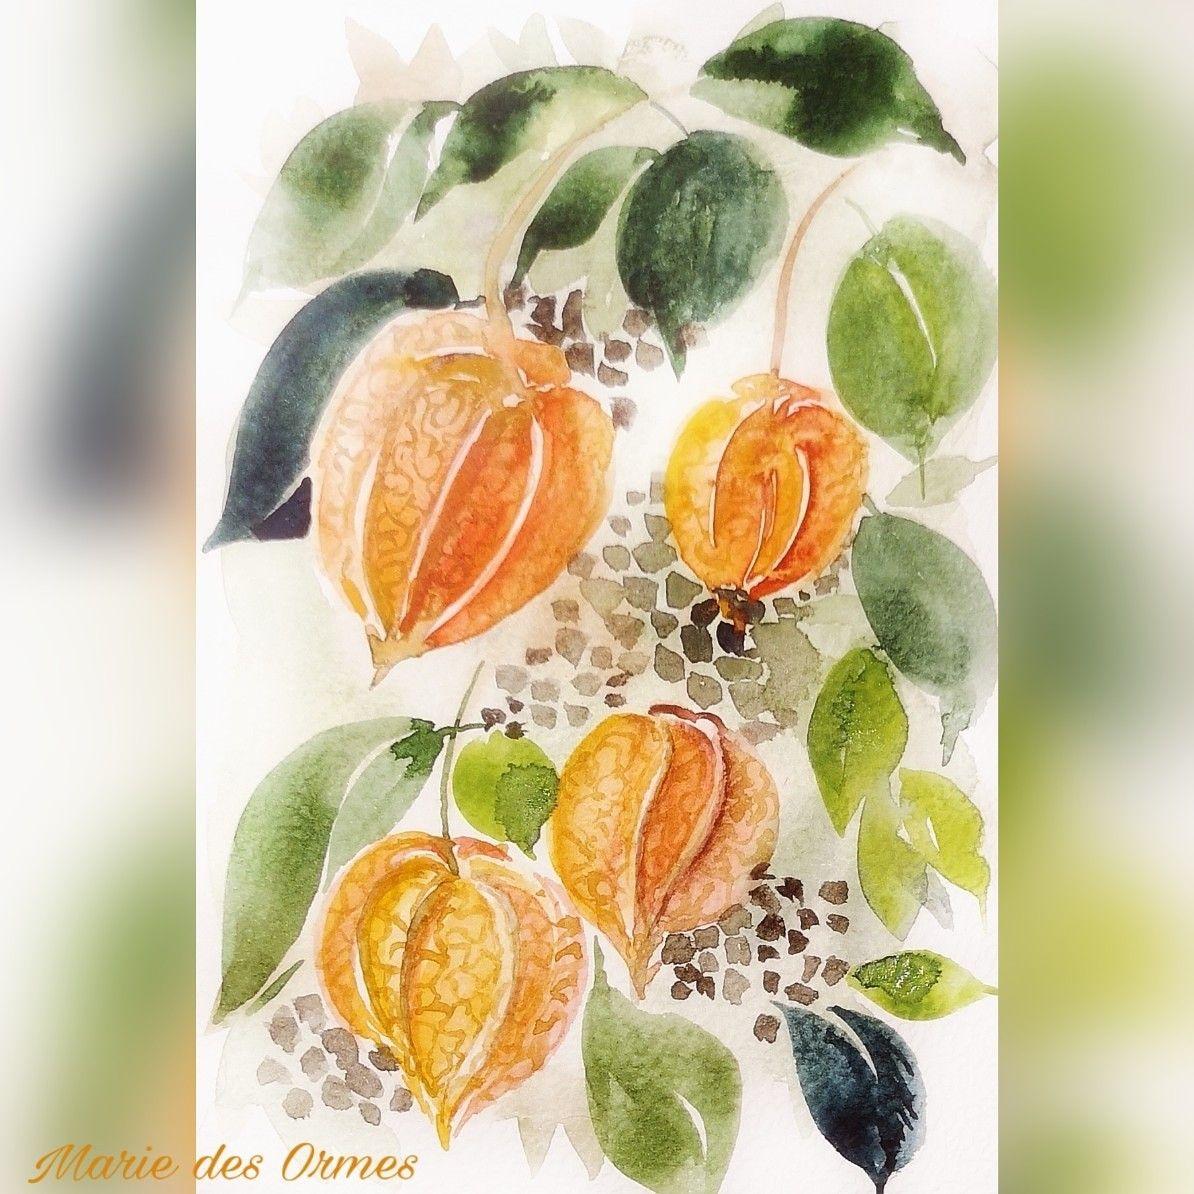 #amourencage #physalis #aquarellepainting #aquarelleaddict #aquarelles #watercolorflowers #watercolor_art #leavesinwatercolor #watercolorfloral #aquarela #watercolorarts #comefloralwithus #comeflowerwithus @picsart_official_editing #watercolorart #watercolour #mpdesormiere #marie_des_ormes